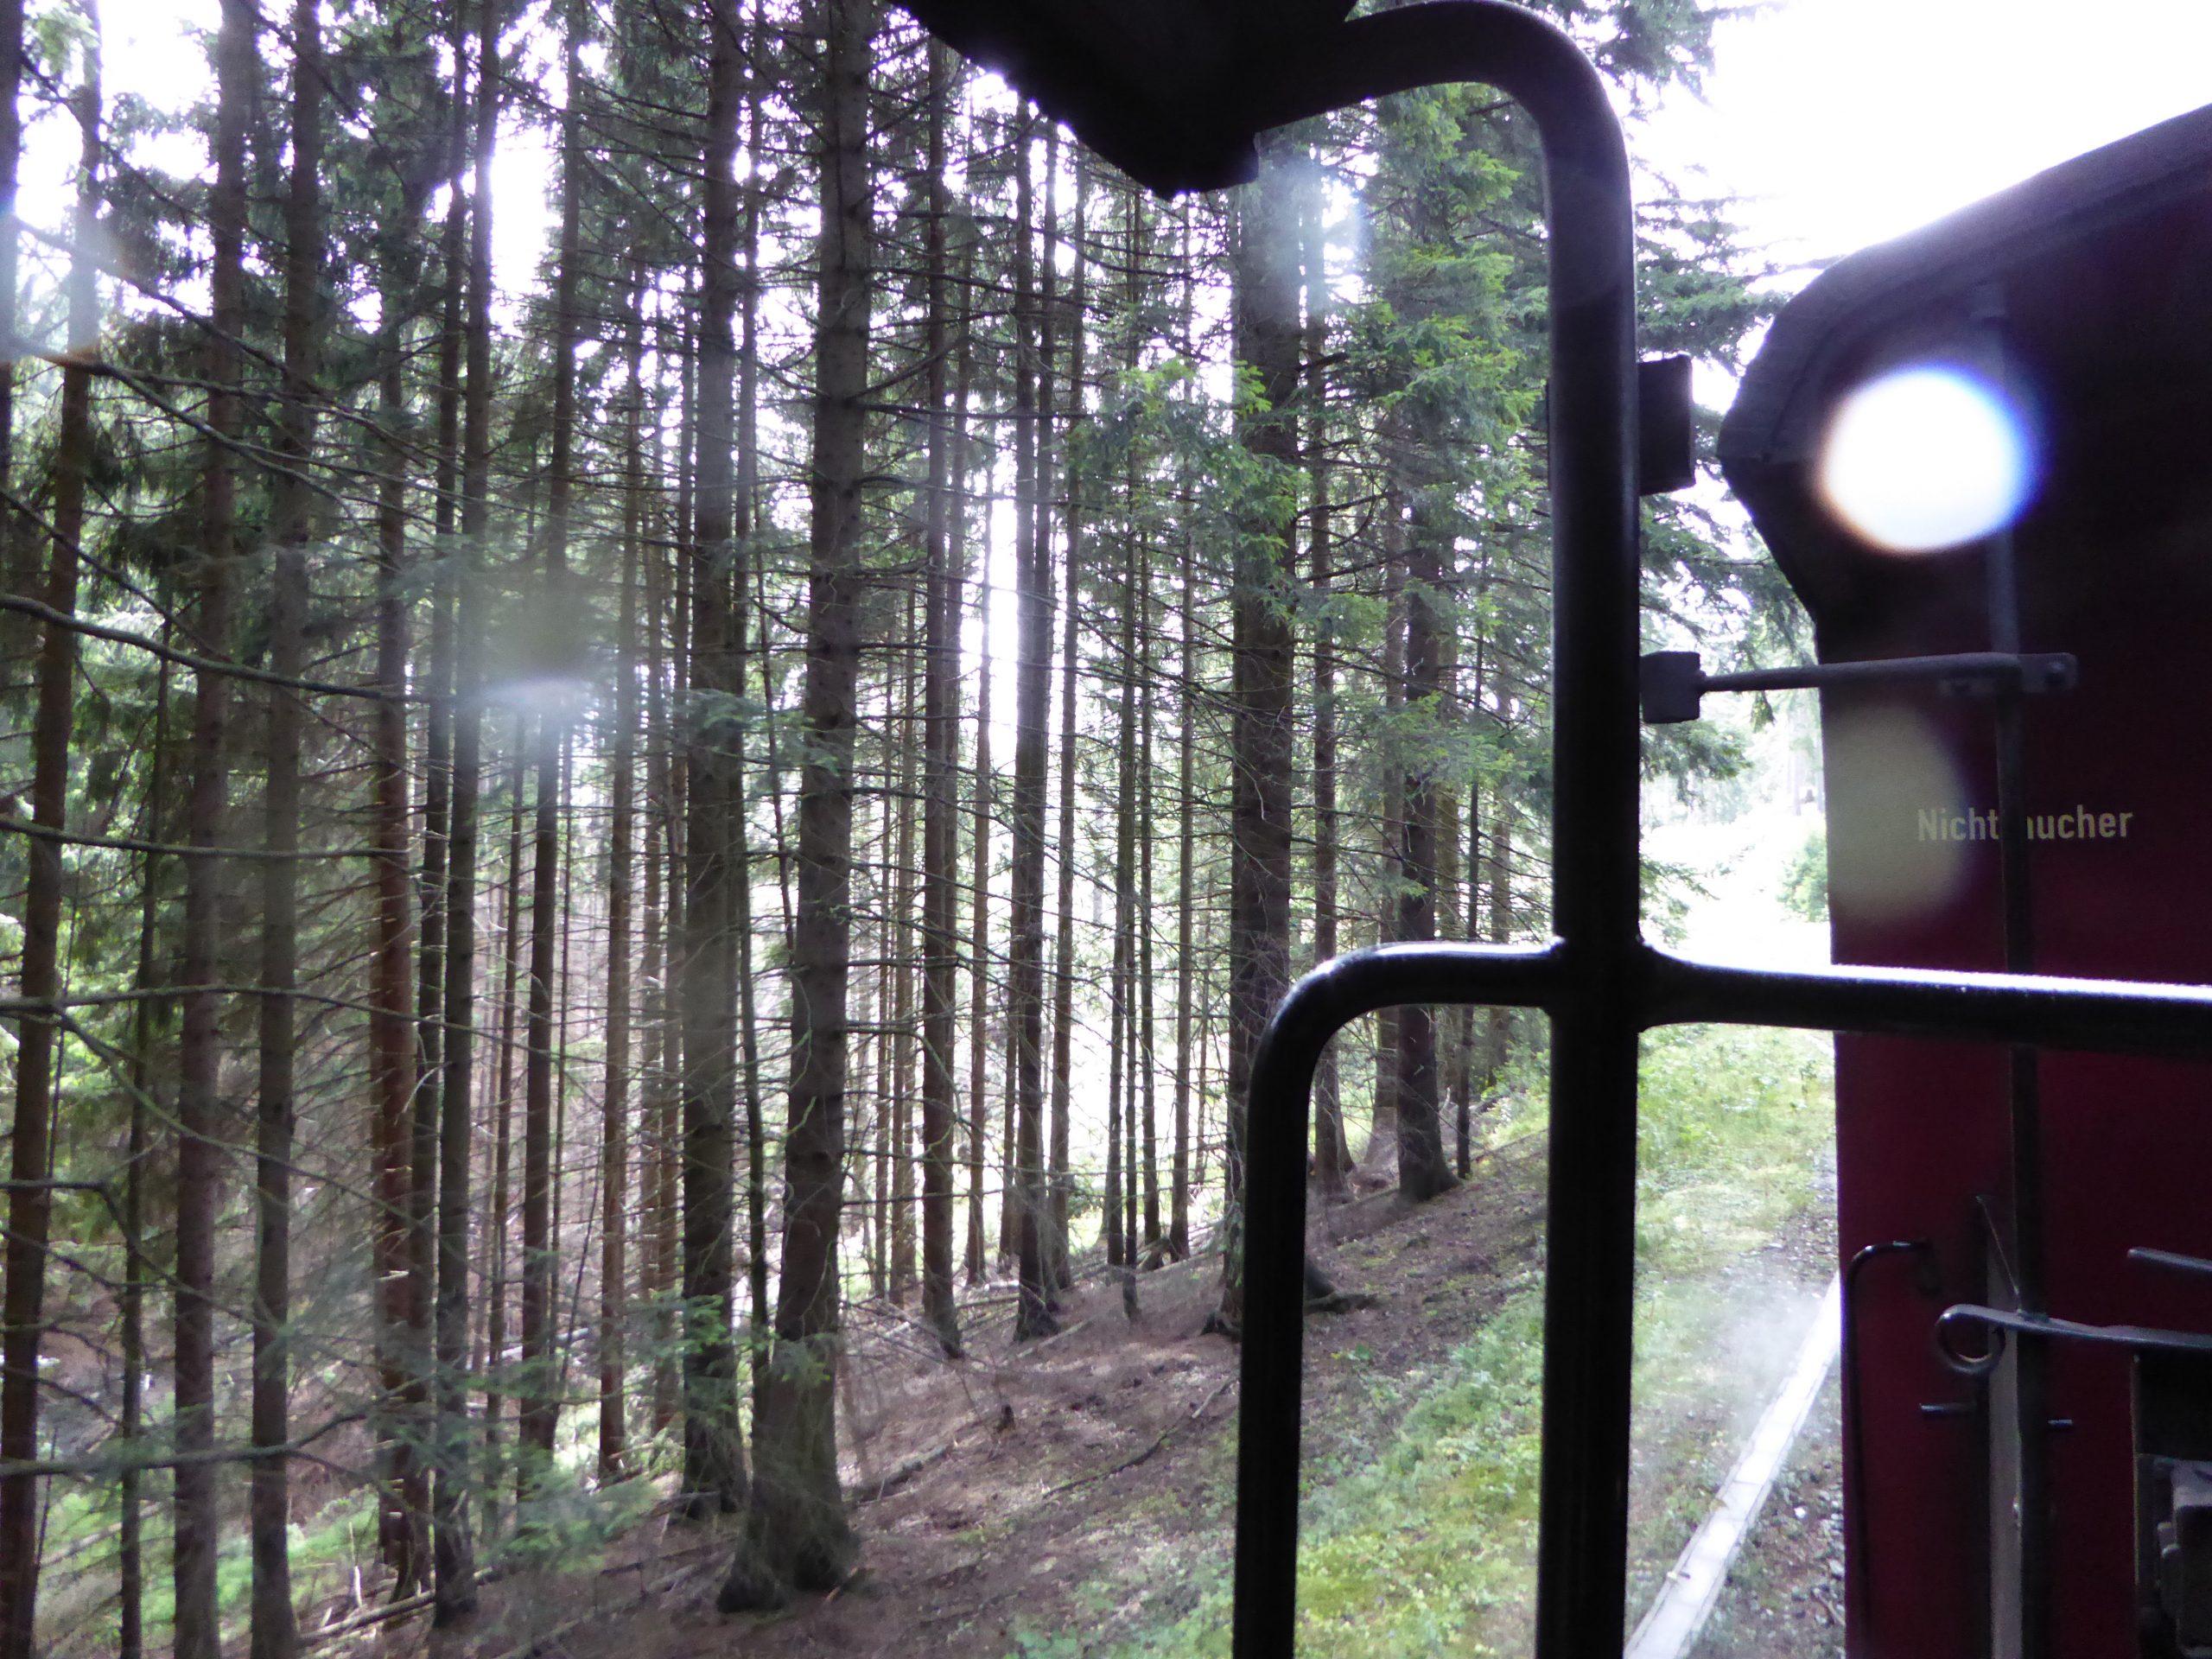 13 Harz Impr. 6